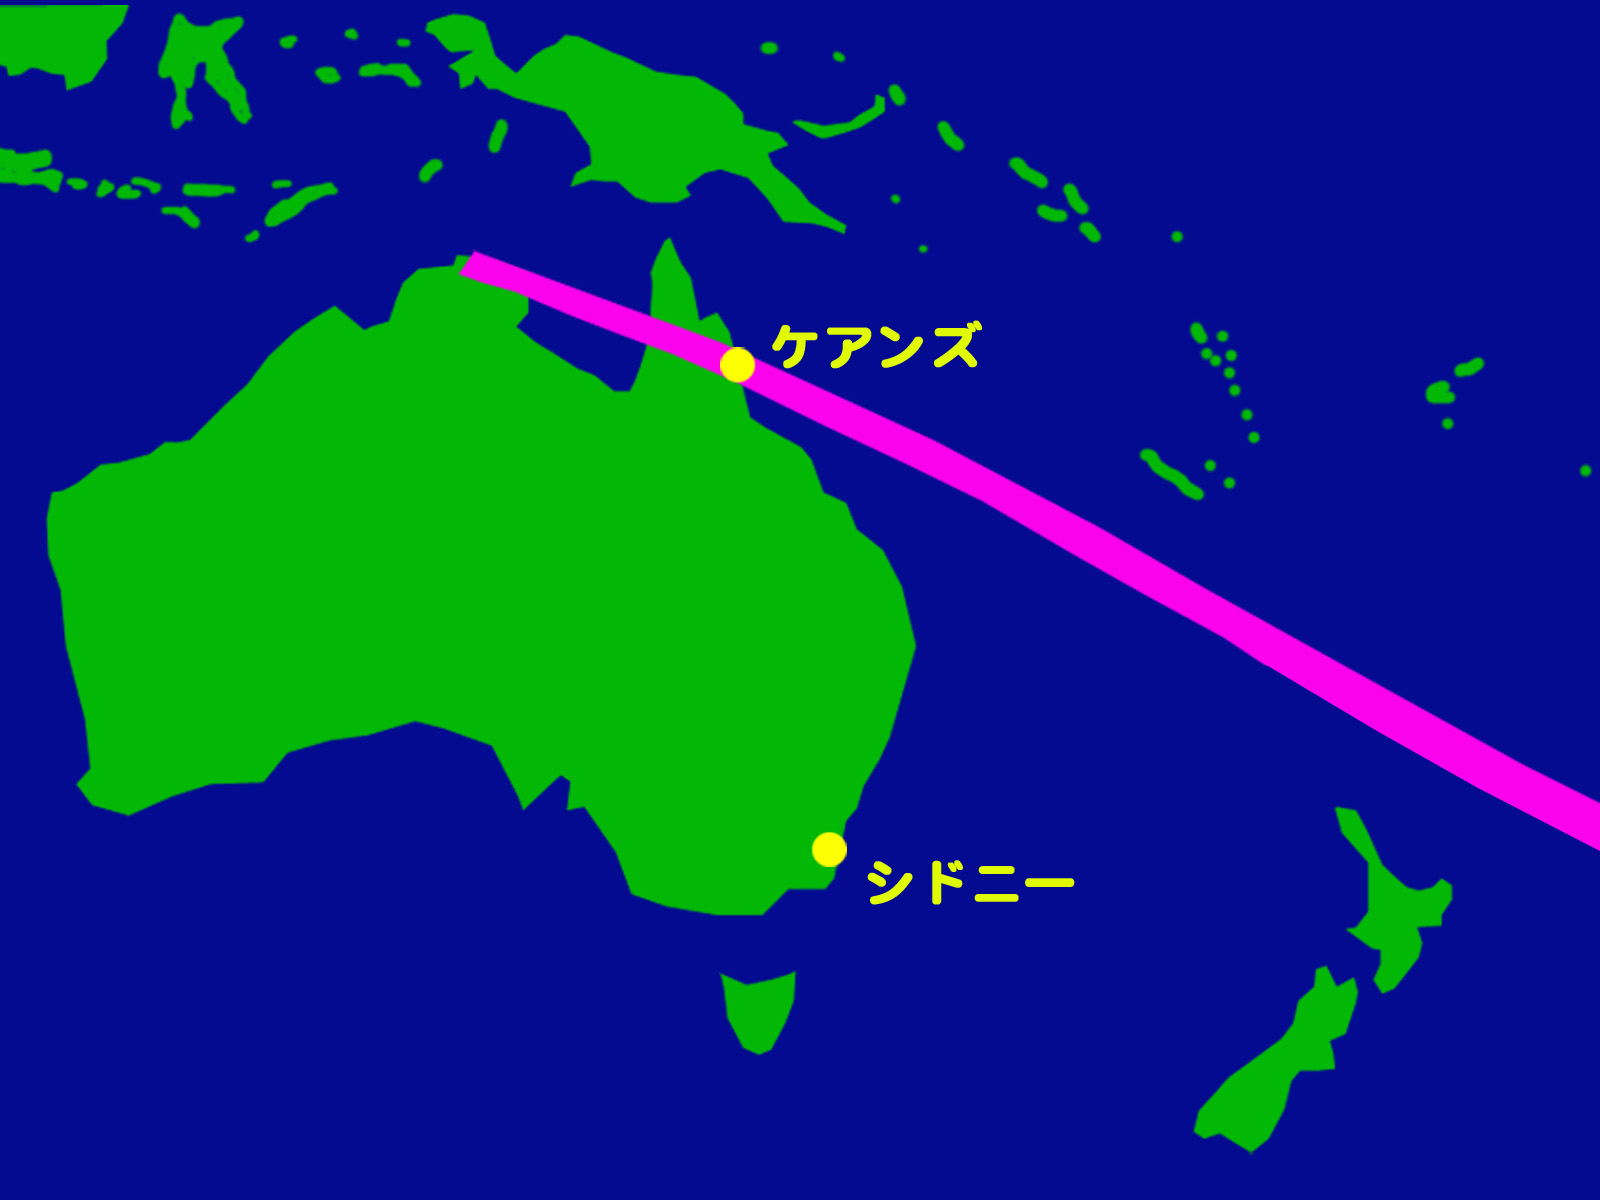 http://www.ncsm.city.nagoya.jp/study/astro/20121114.jpg